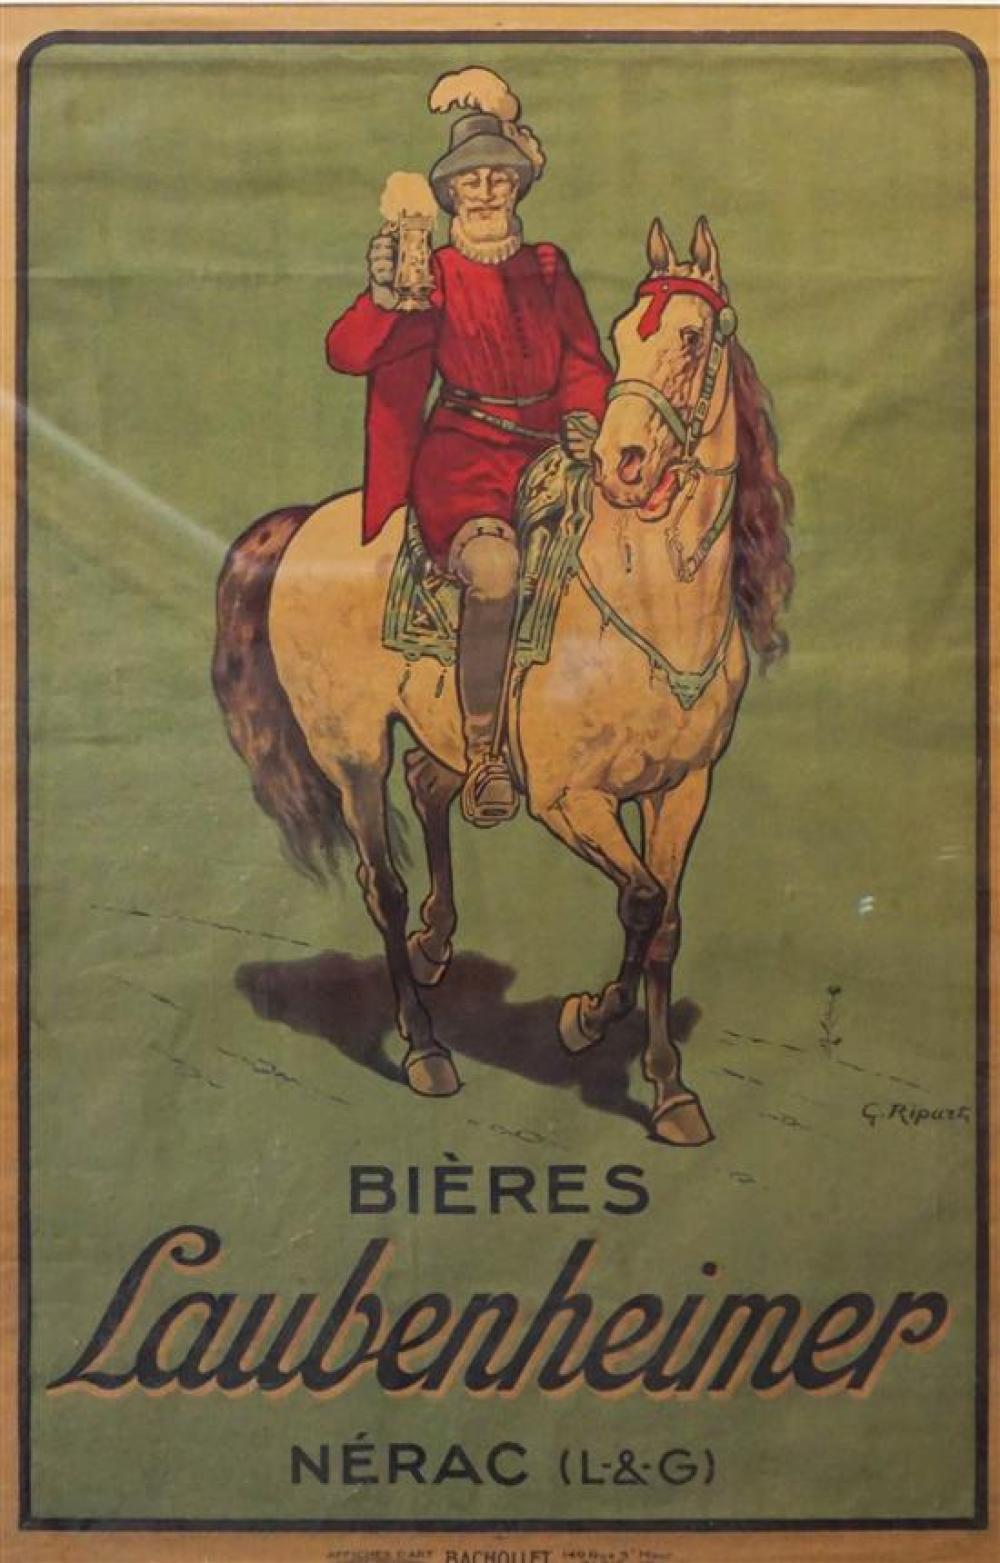 Bieres Laibenheimer Poster, 52 x 35 inches